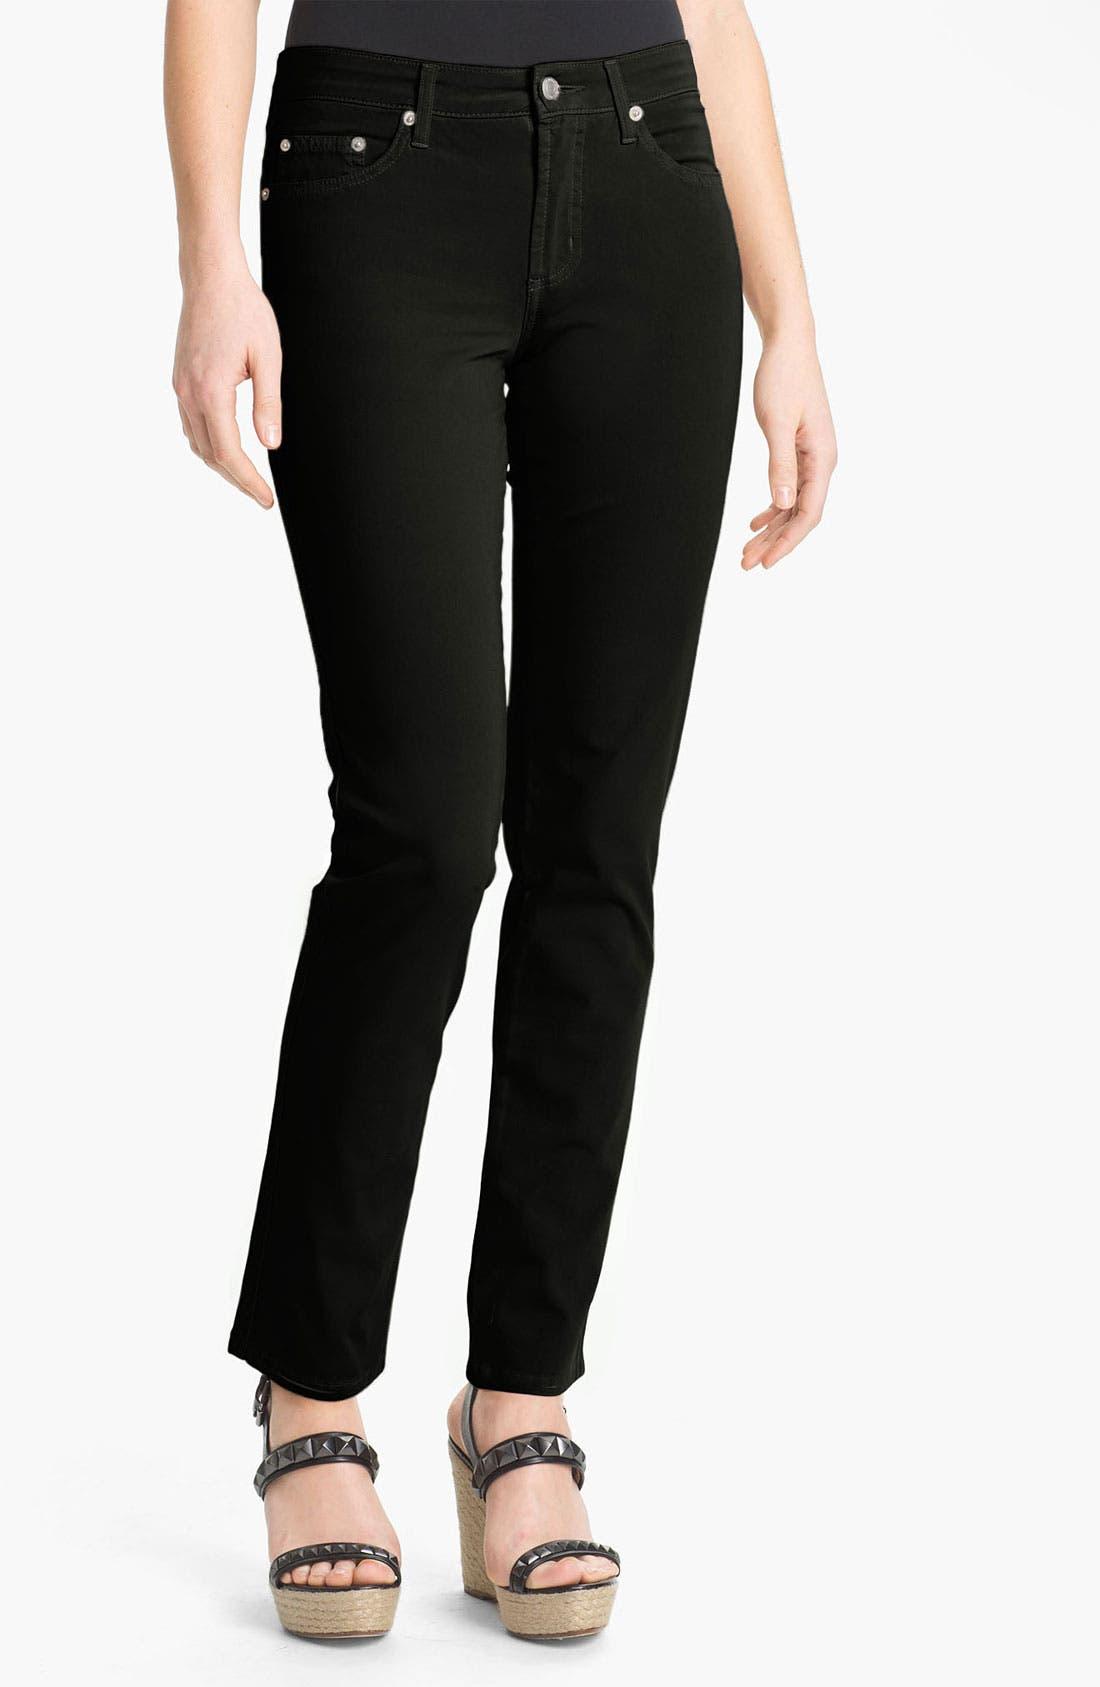 FABRIZIO GIANNI 5-Pocket Slim Stretch Jeans, Main, color, 001